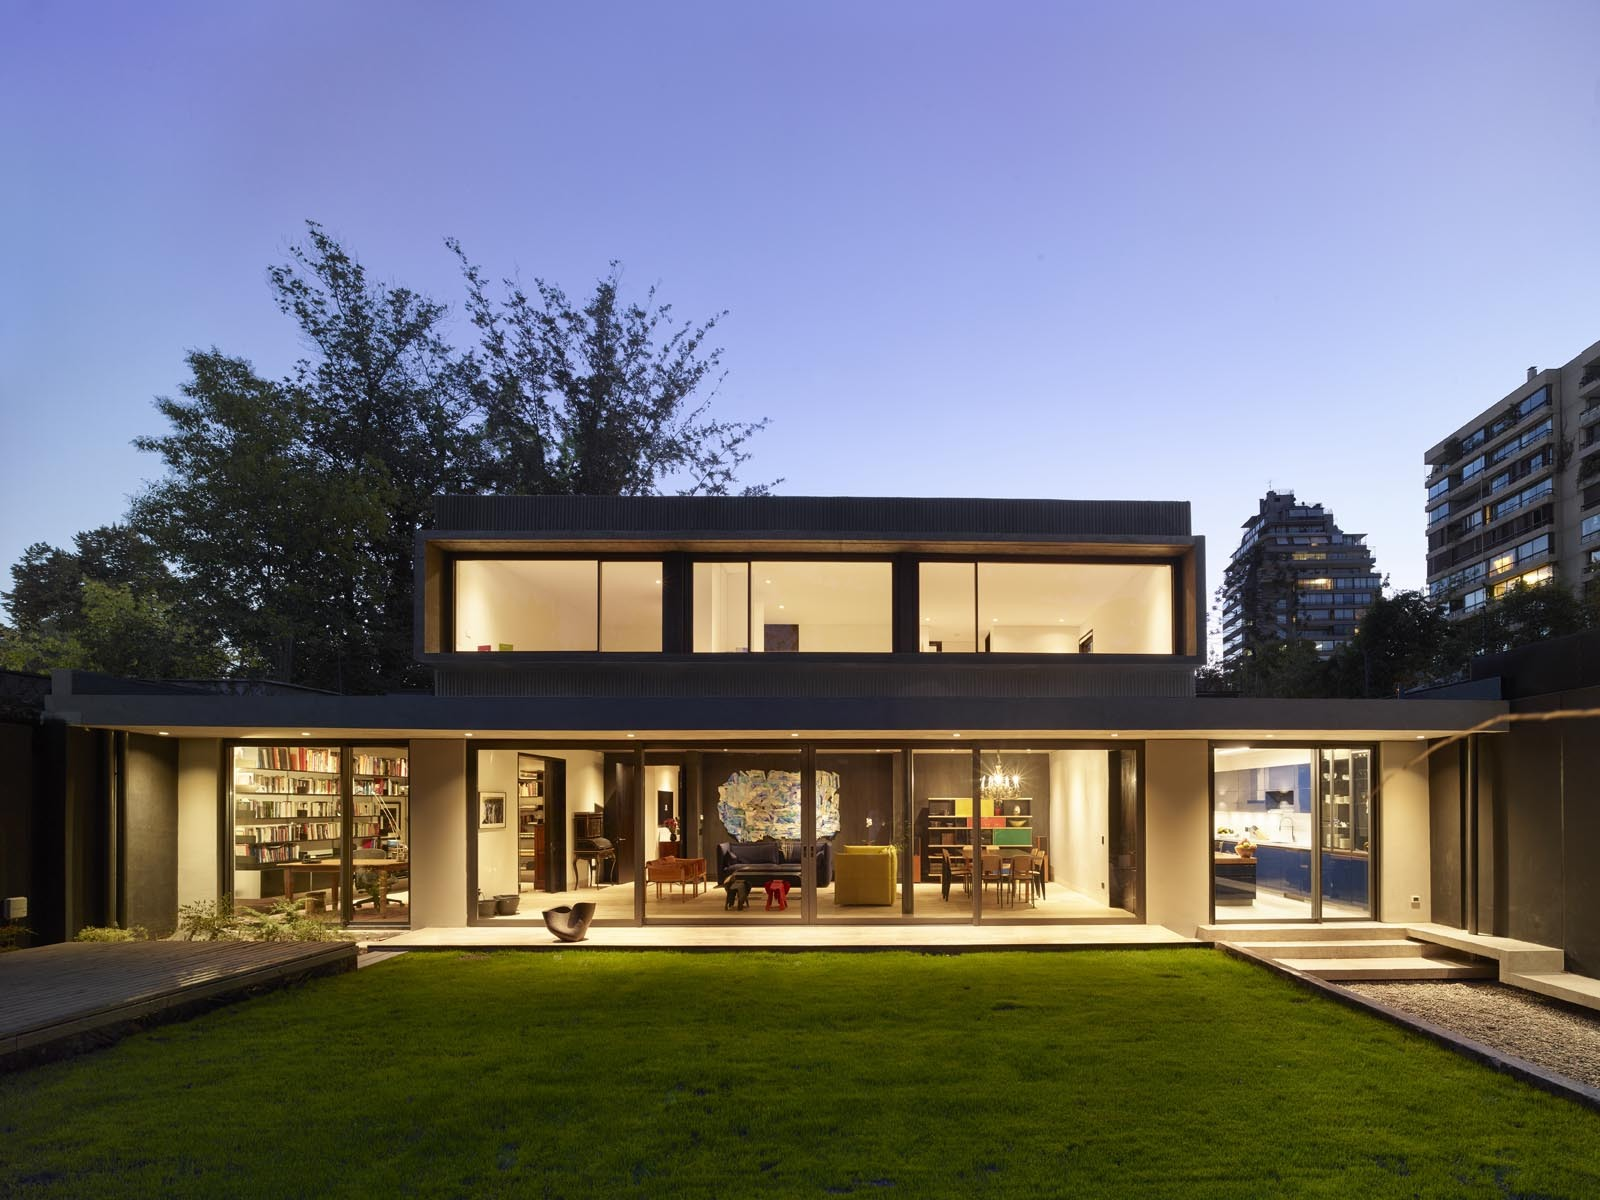 Galer a de casa m laga prietoschaffer arquitectos 9 - Arquitectos interioristas malaga ...